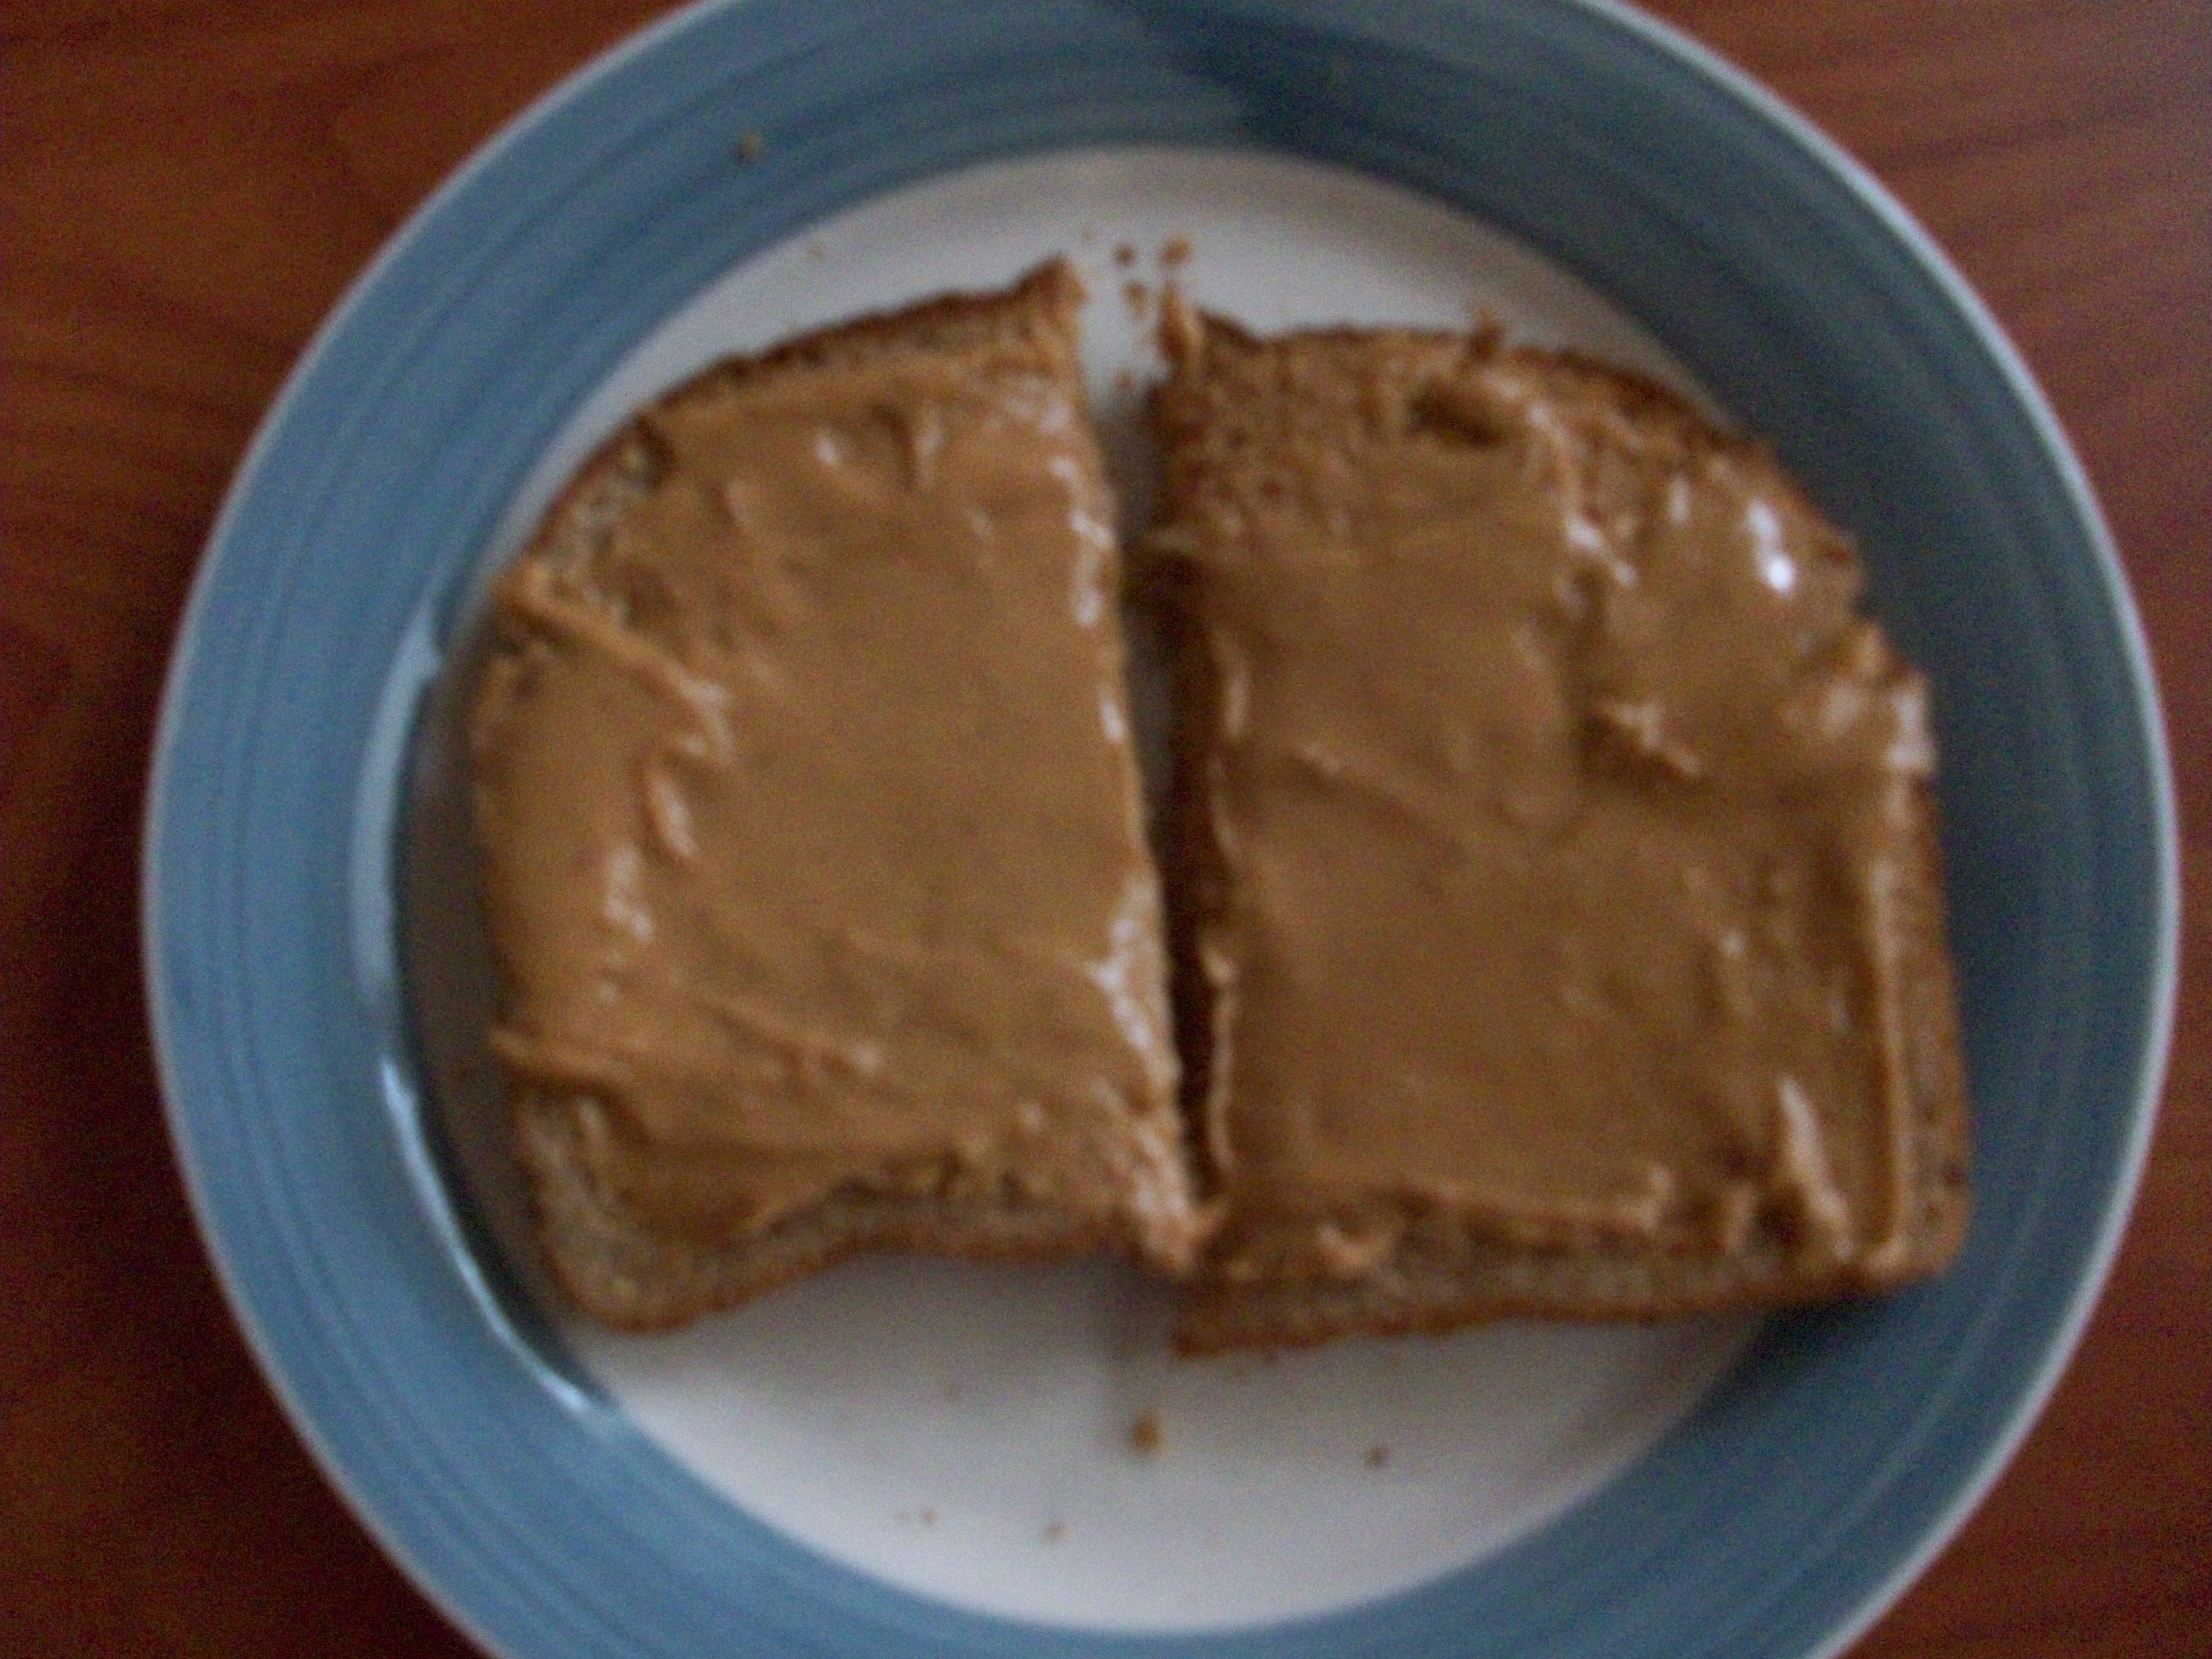 peanut butter toast. part one of breakfast yesterday